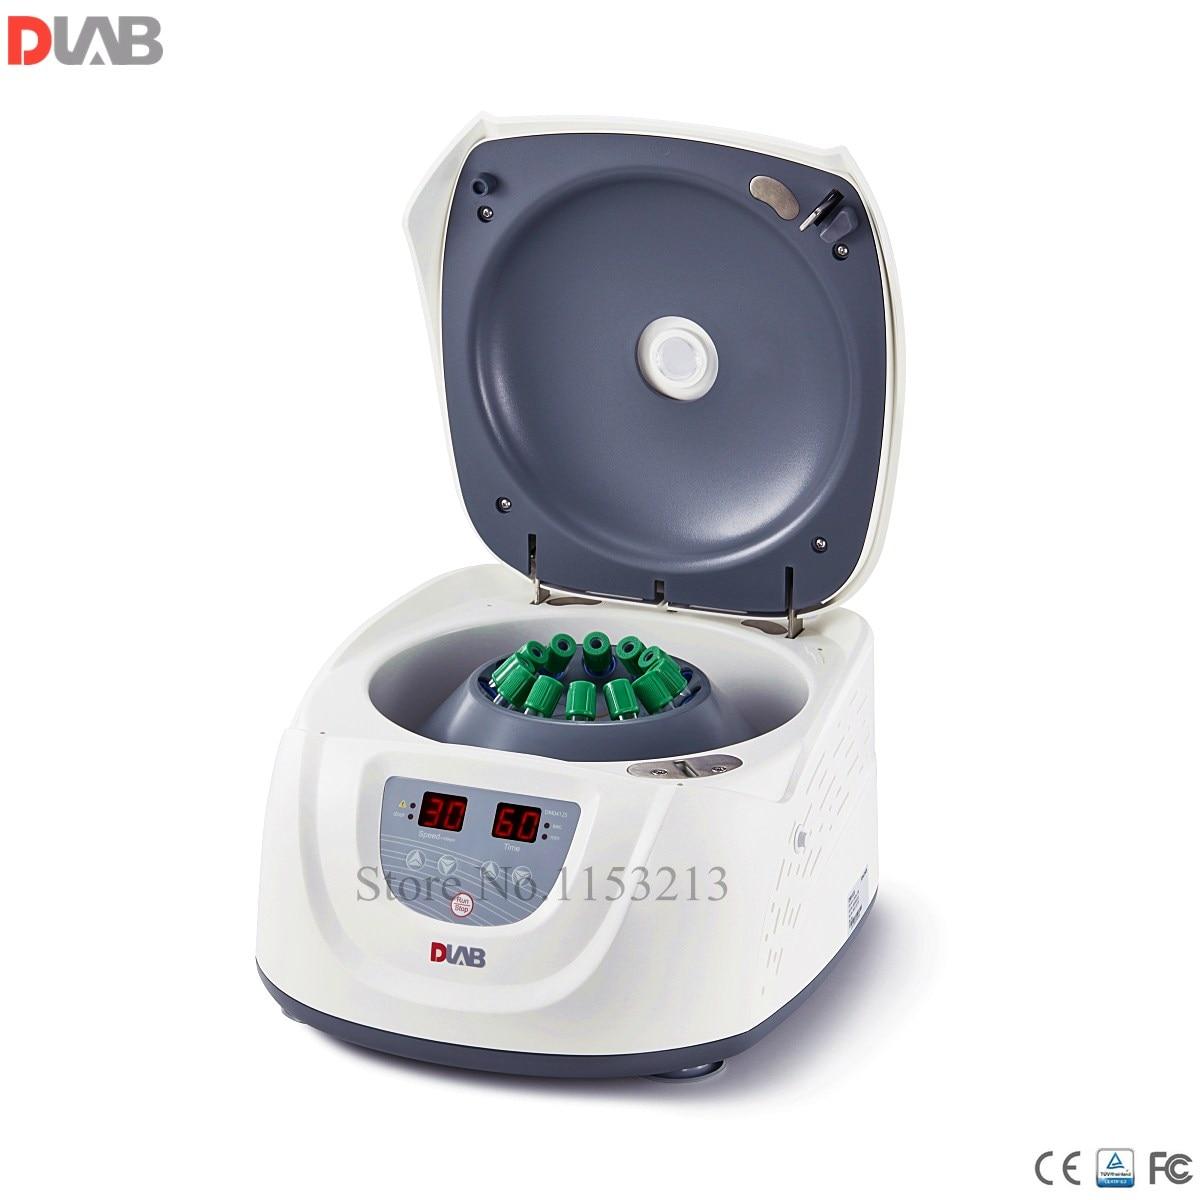 Dragon lab DM0412S centrífuga clínica de tipo económico de 15 ml * 8, o 10 ml/7 ml/5 ml * 12 dlab centrifugado de velocidad lenta 300-4500 rpm motor de CC